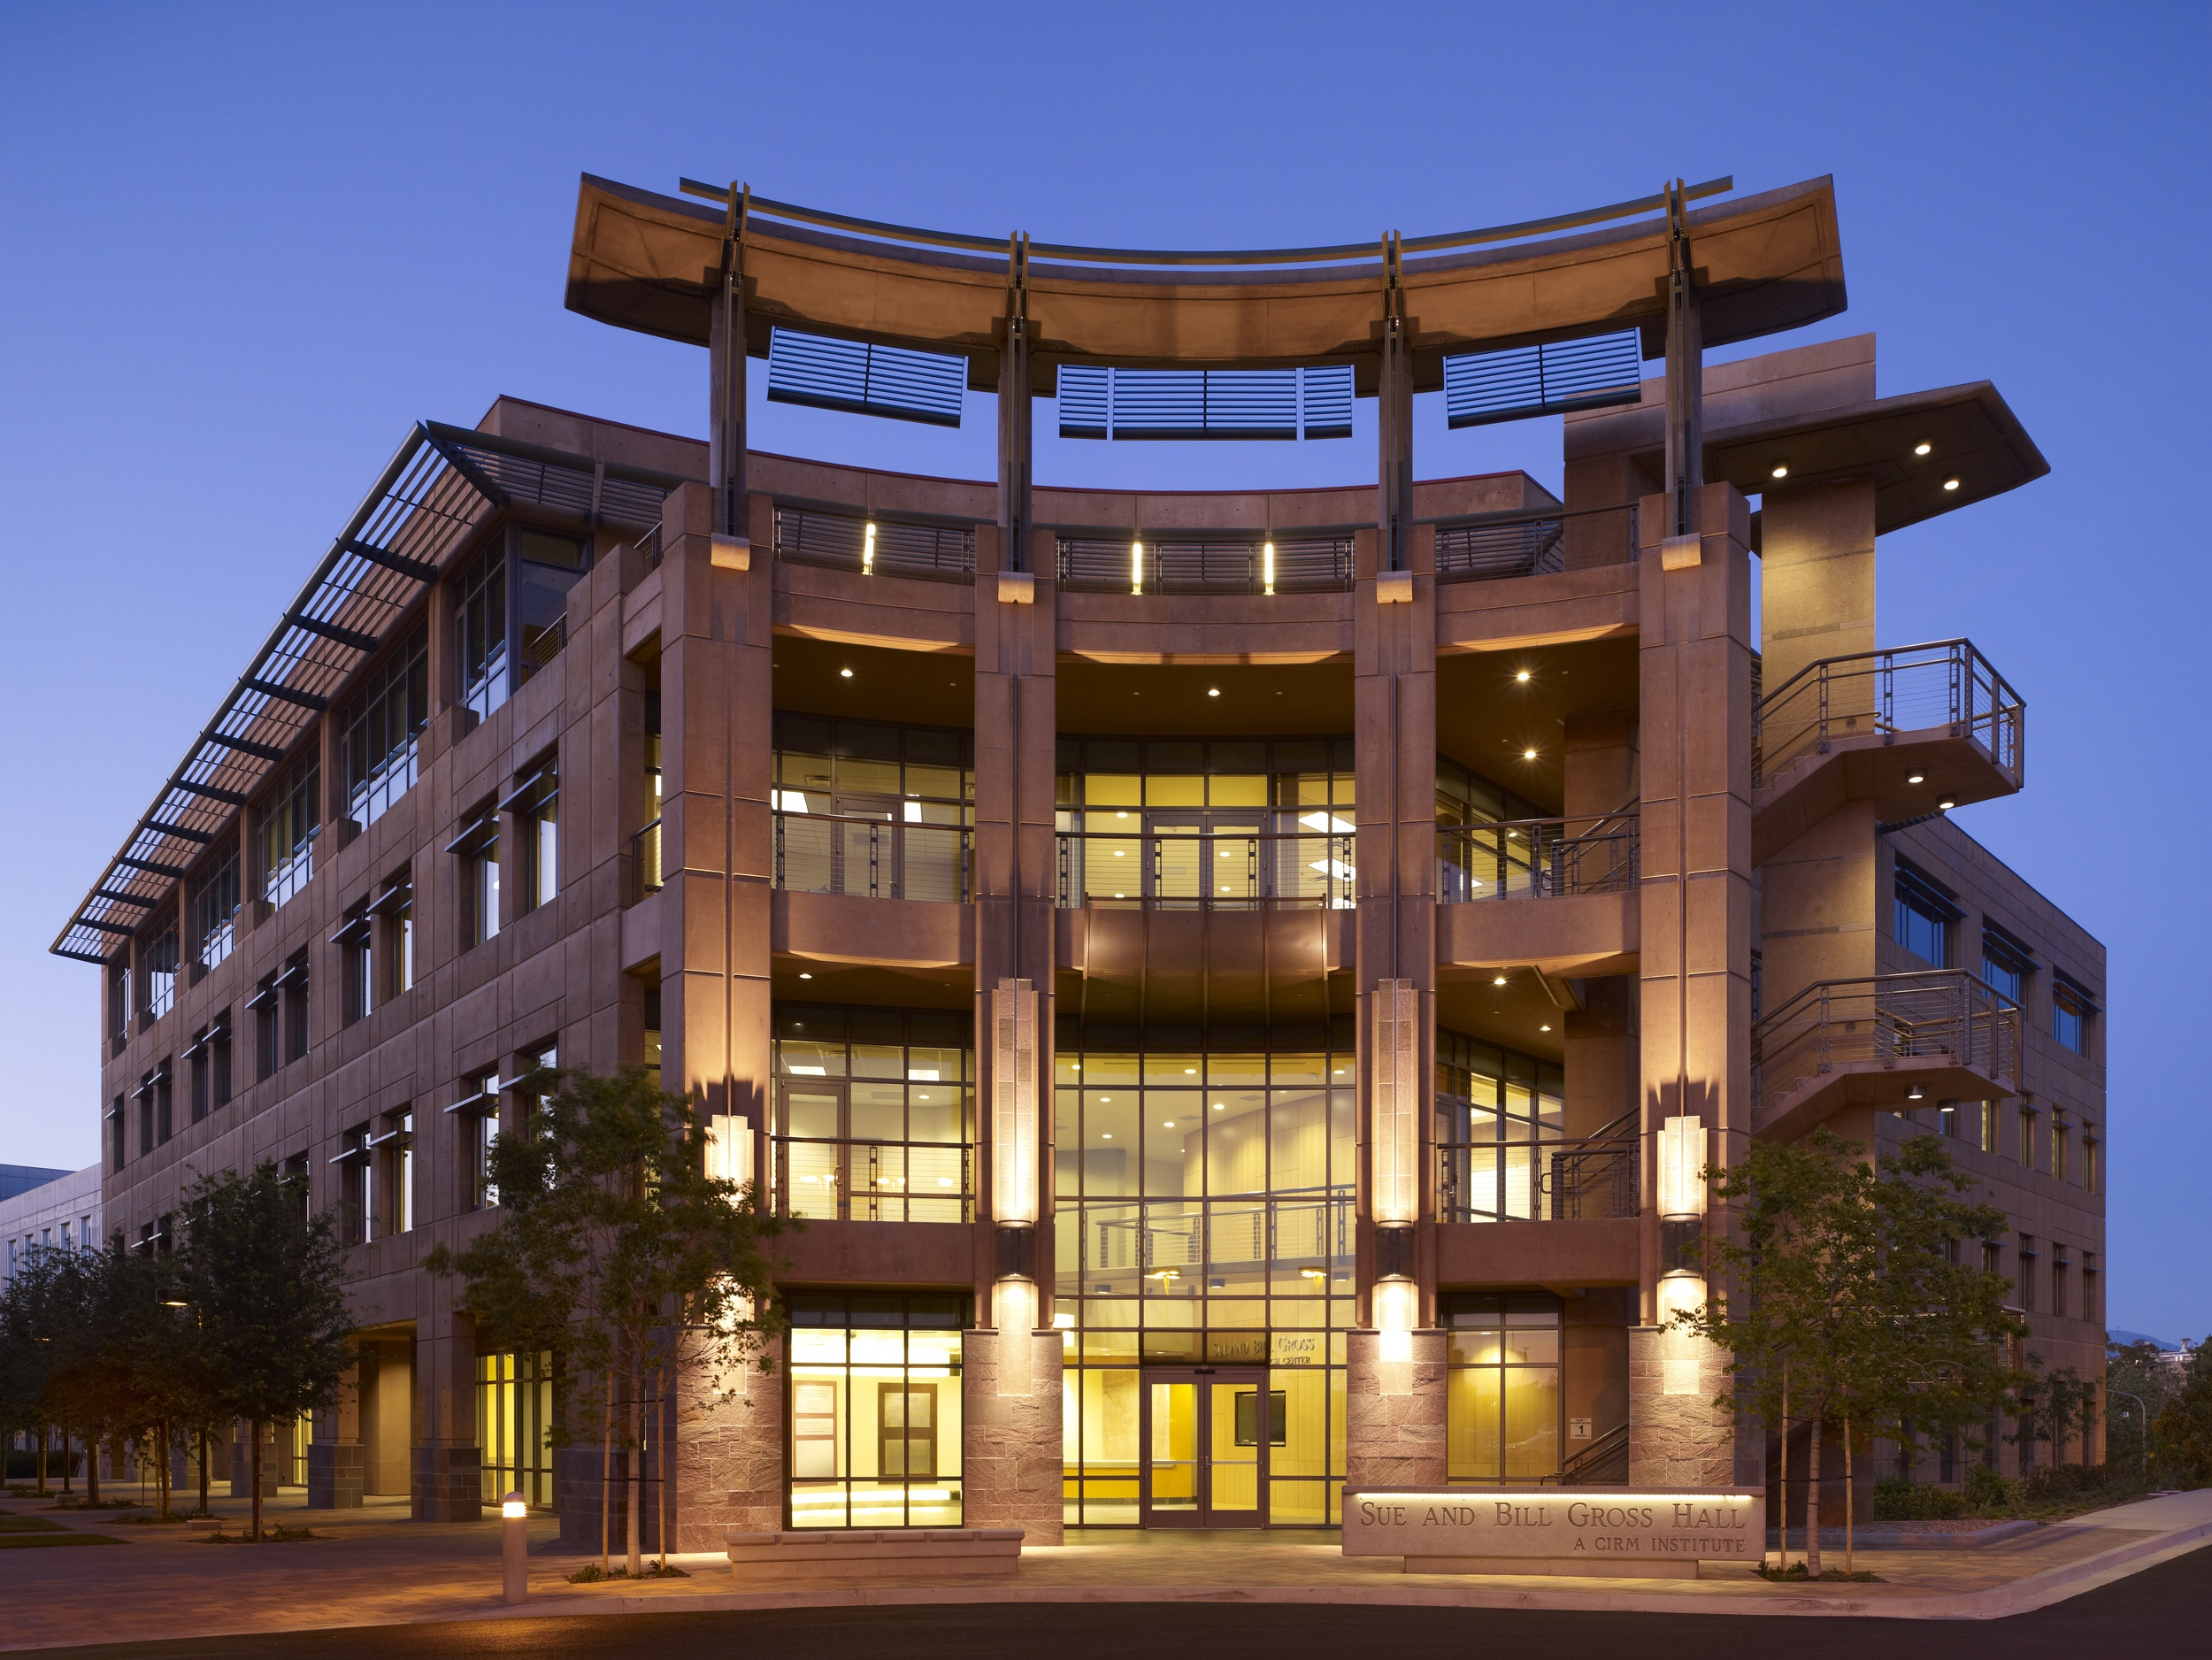 Sue & Bill Gross Stem Cell Research lab.jpg